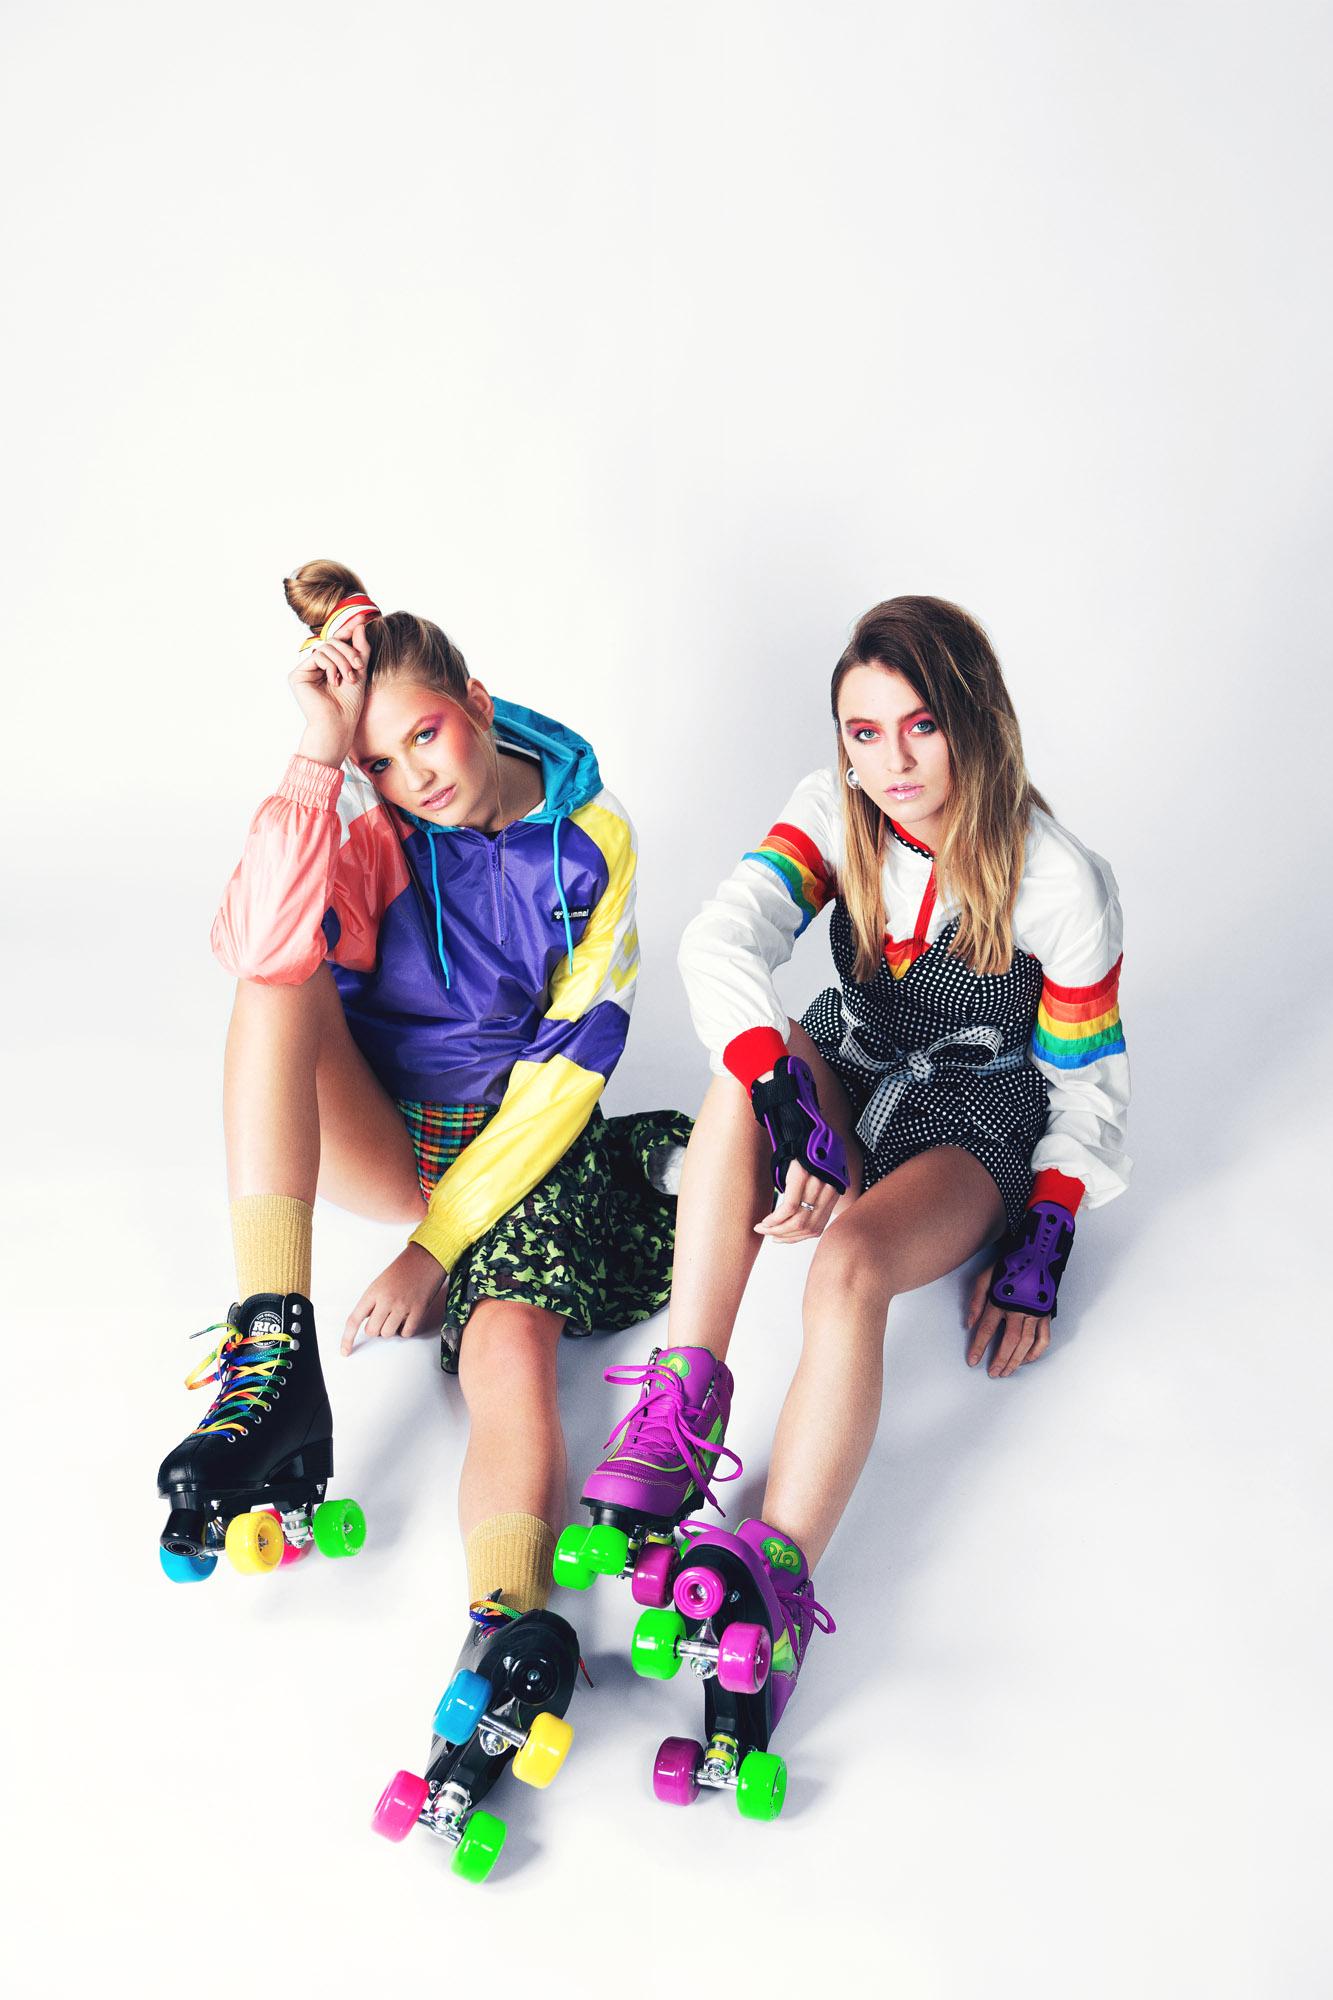 Left  ALDONA wears Tracksuit Jacket: HUMMEL HIVE, Top:LES ANIMAUX,Bikini Set:LILLIPUT & FELIX,Scarf: RIXO LONDON(Young British Designers),Socks:STANCE,Roller Skates: SLICK WILLIES  Right  Phoebe Wright wears Windbreaker: ROKIT, Jumpsuit: C/MEO COLLECTIVE, Earrings: CIVILIAN LONDON,Wrist pads: SLICK WILLIES Roller Skates: SLICK WILLIES